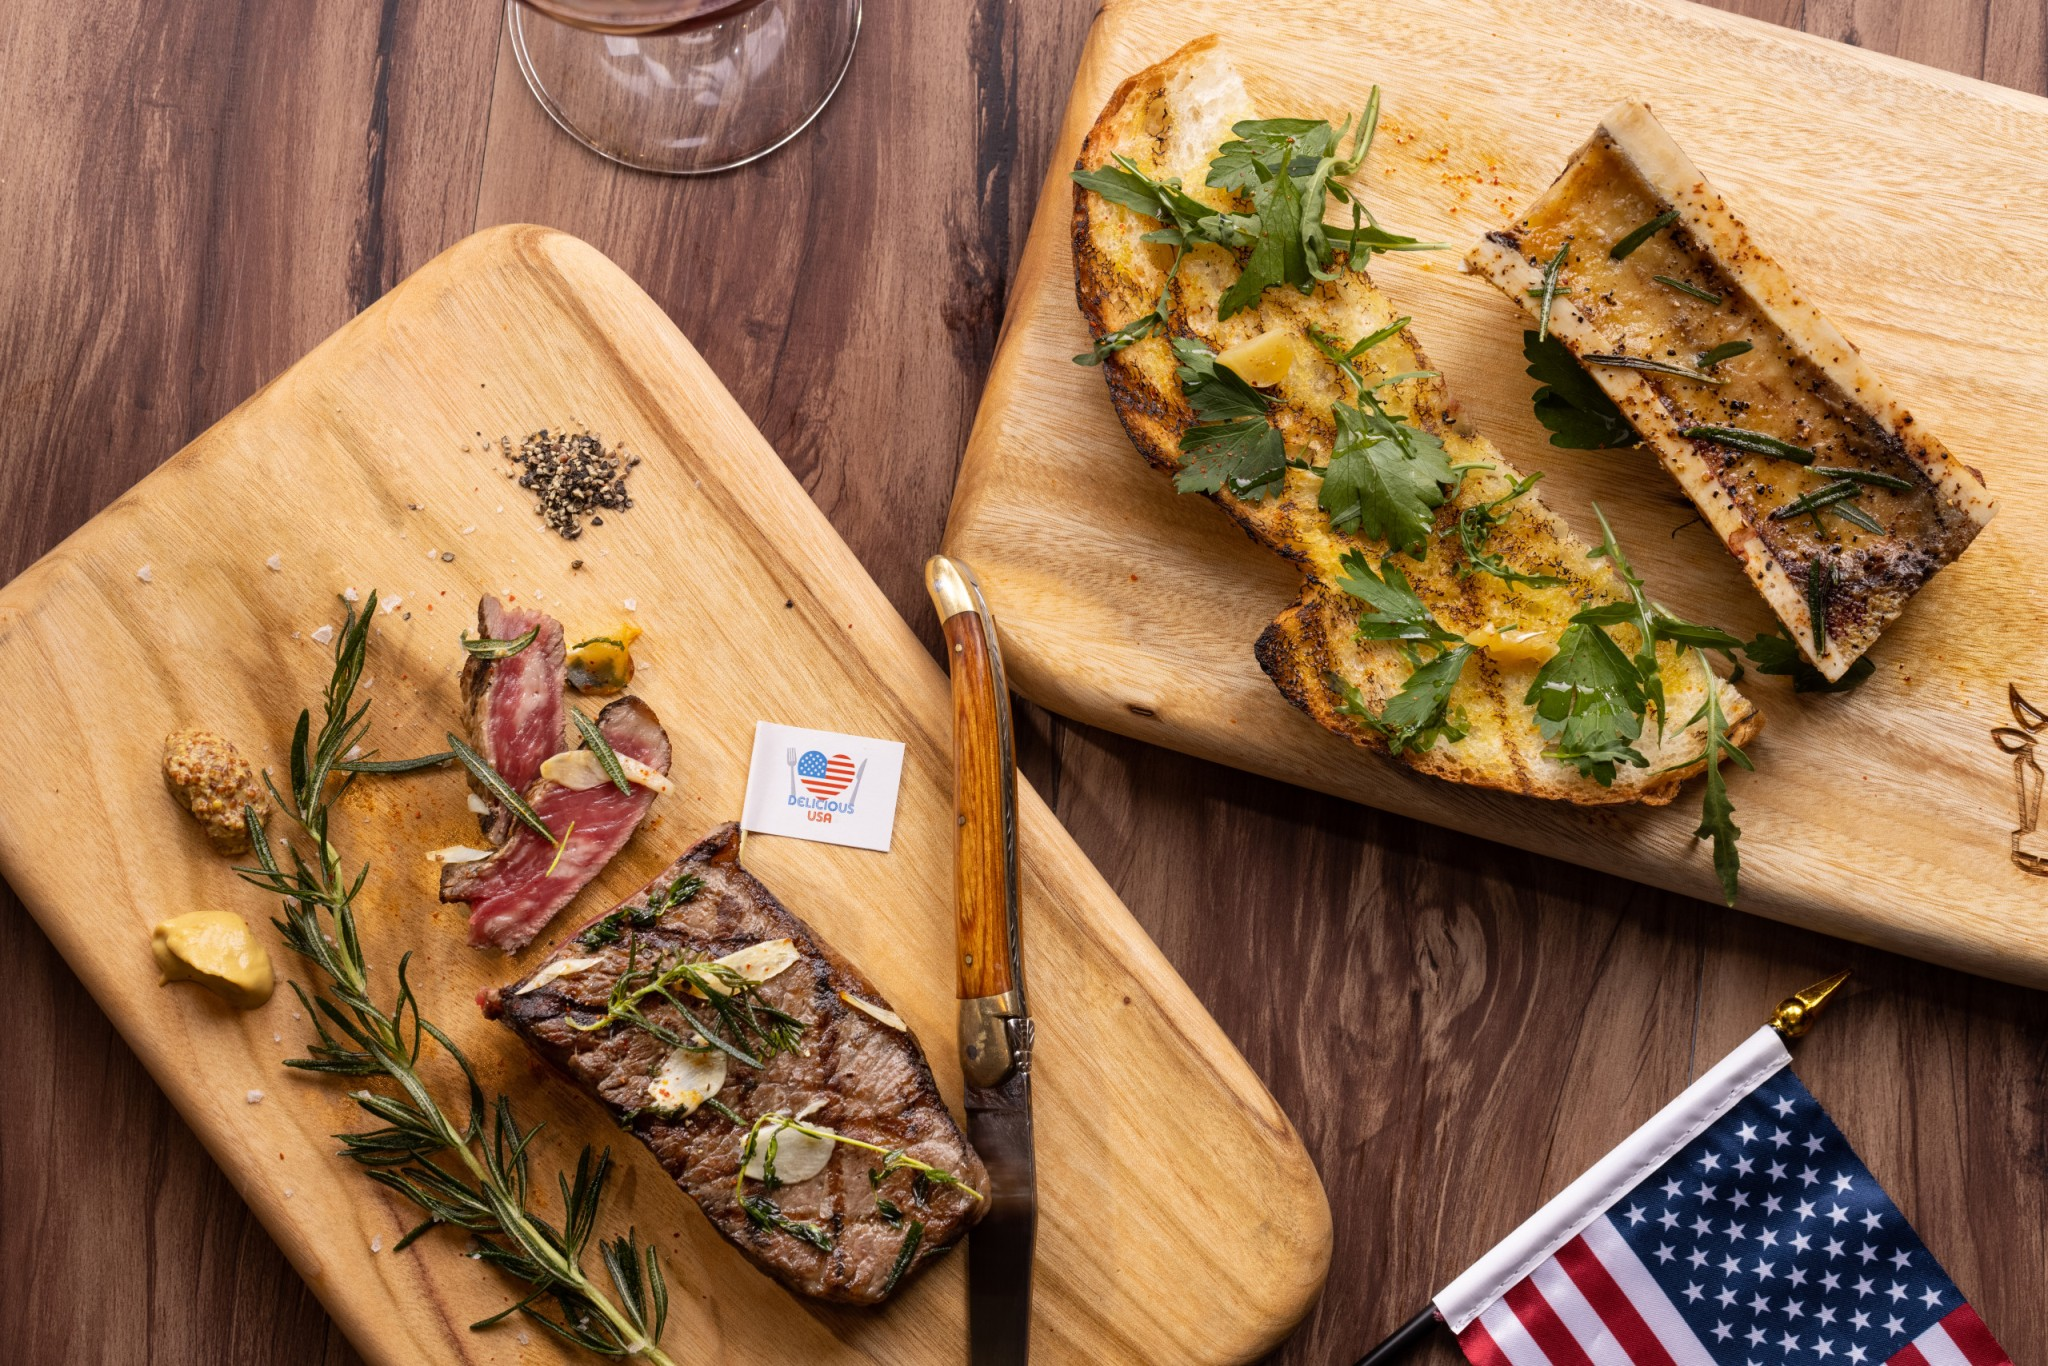 The Sheraton Hong Kong's Oyster & Wine Bar x Delicious USA